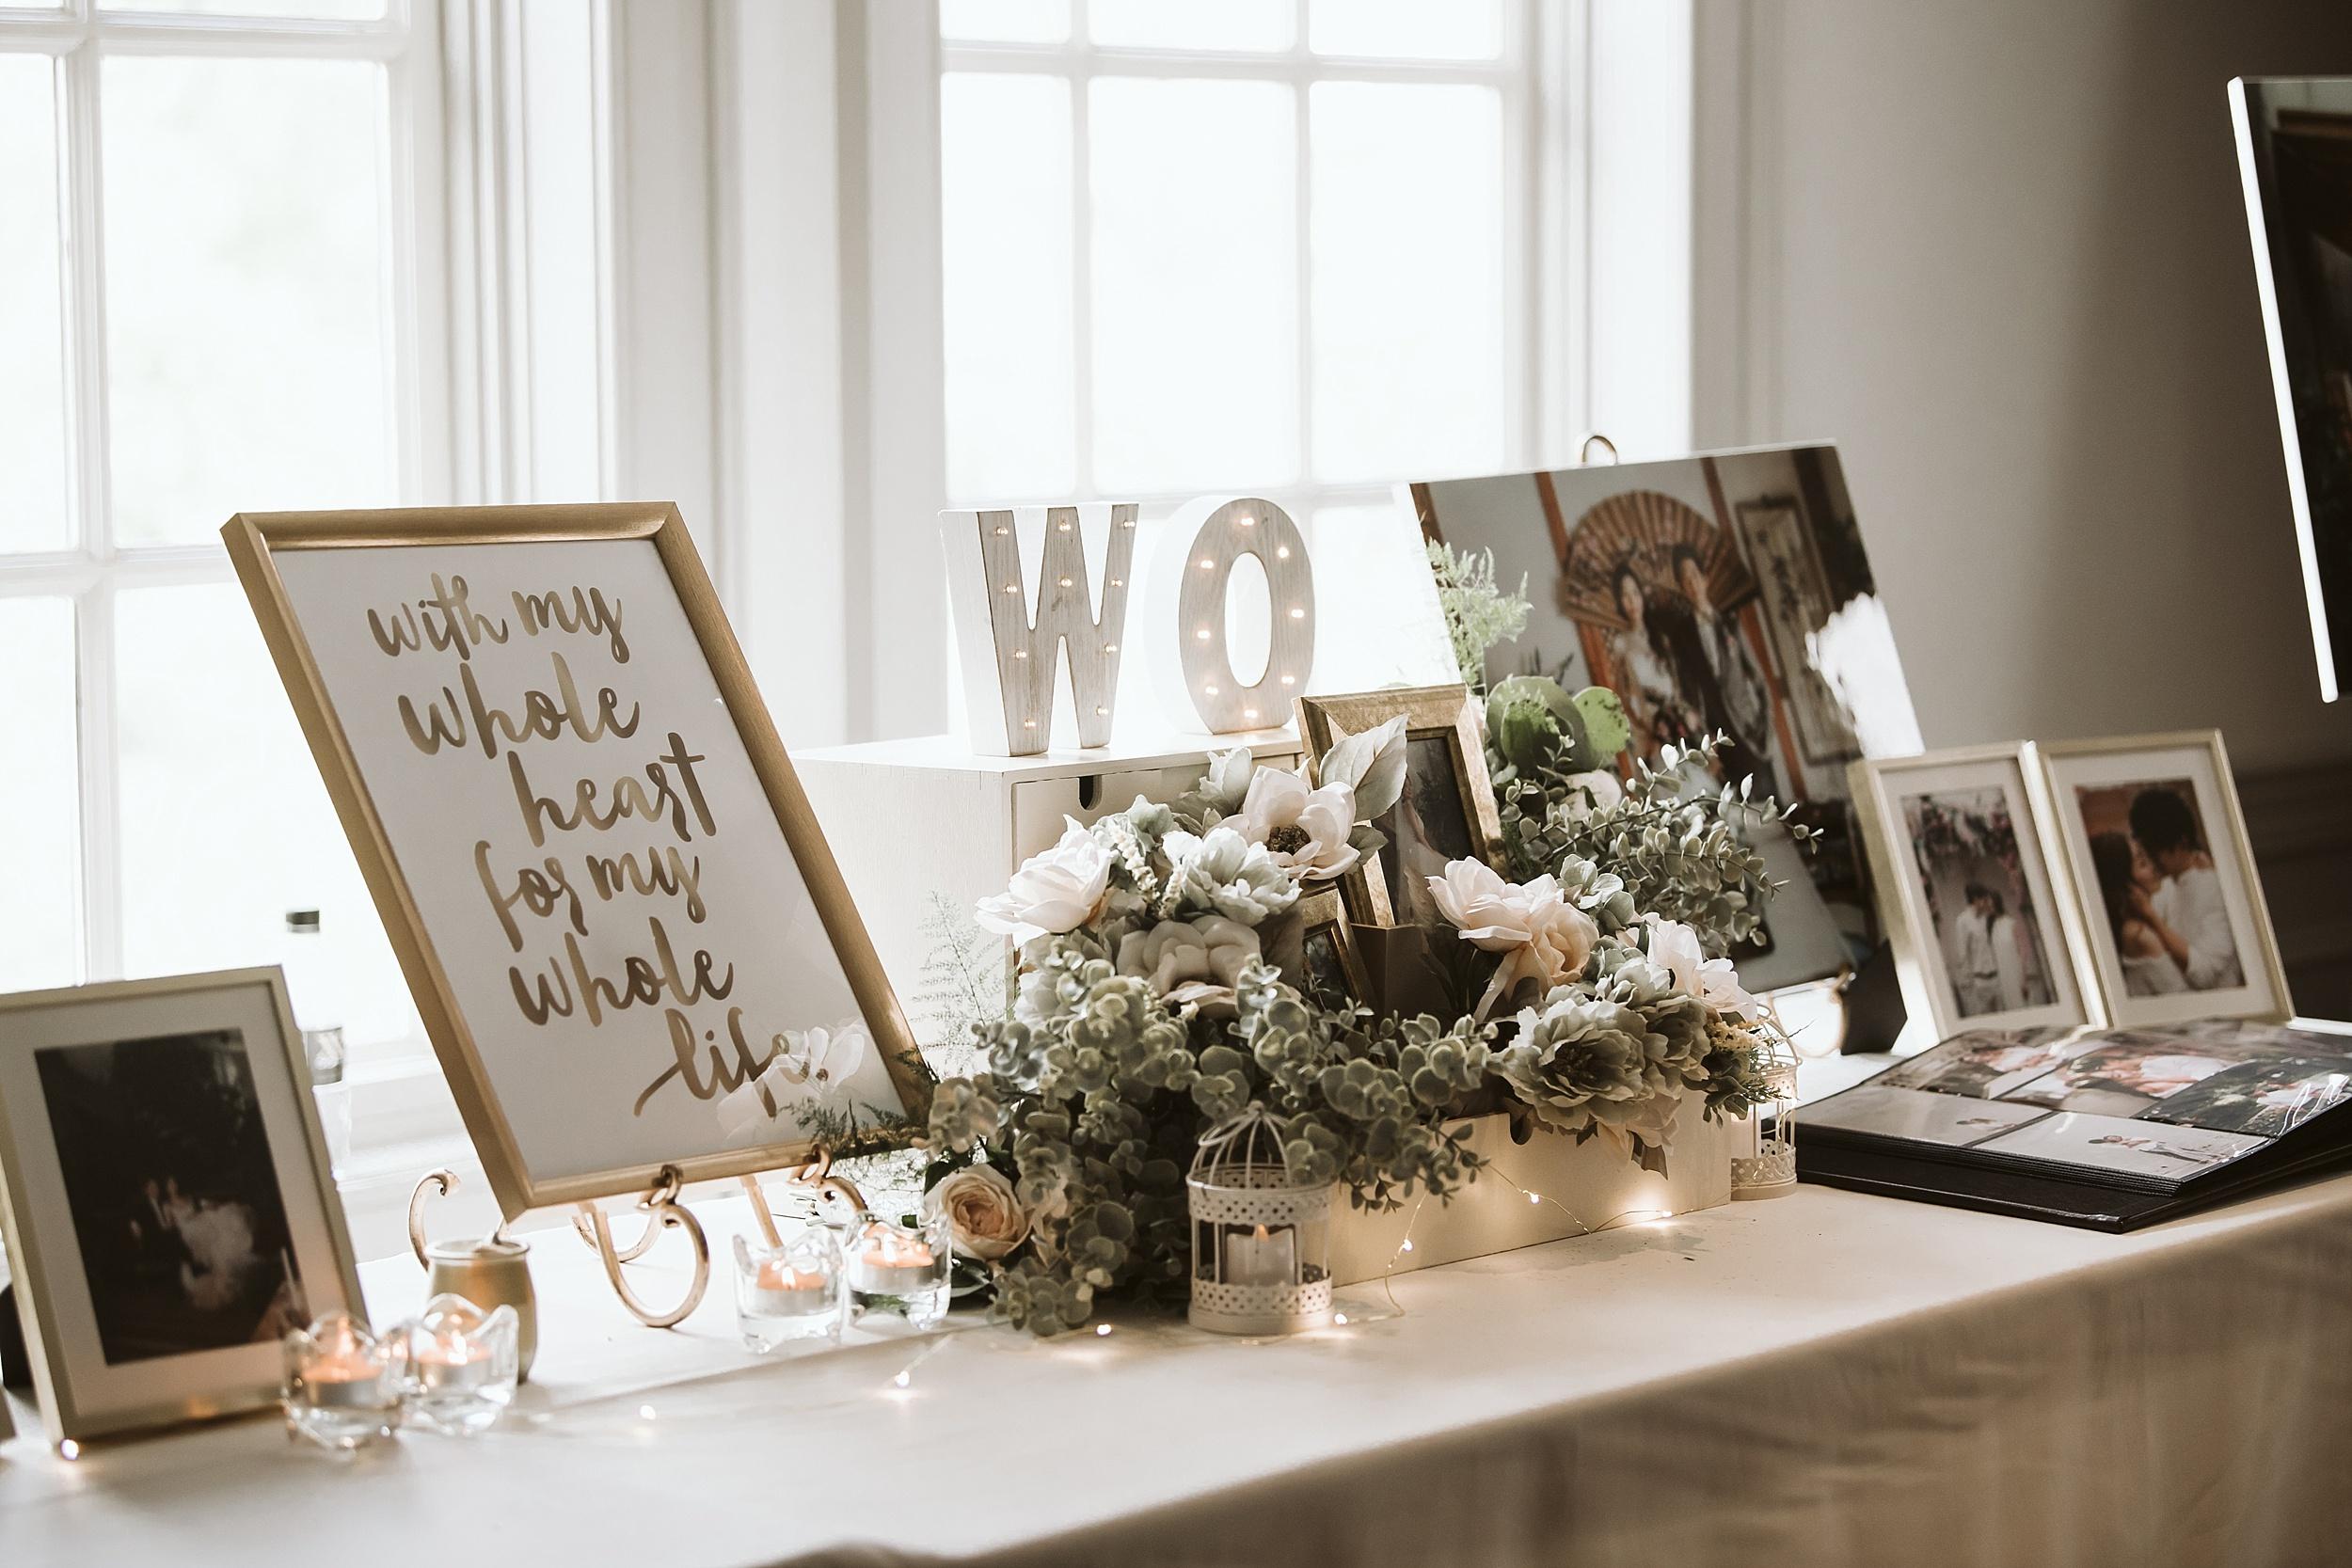 Doctors_House_Kleinburg_Wedding_Toronto_Photographer_0061.jpg